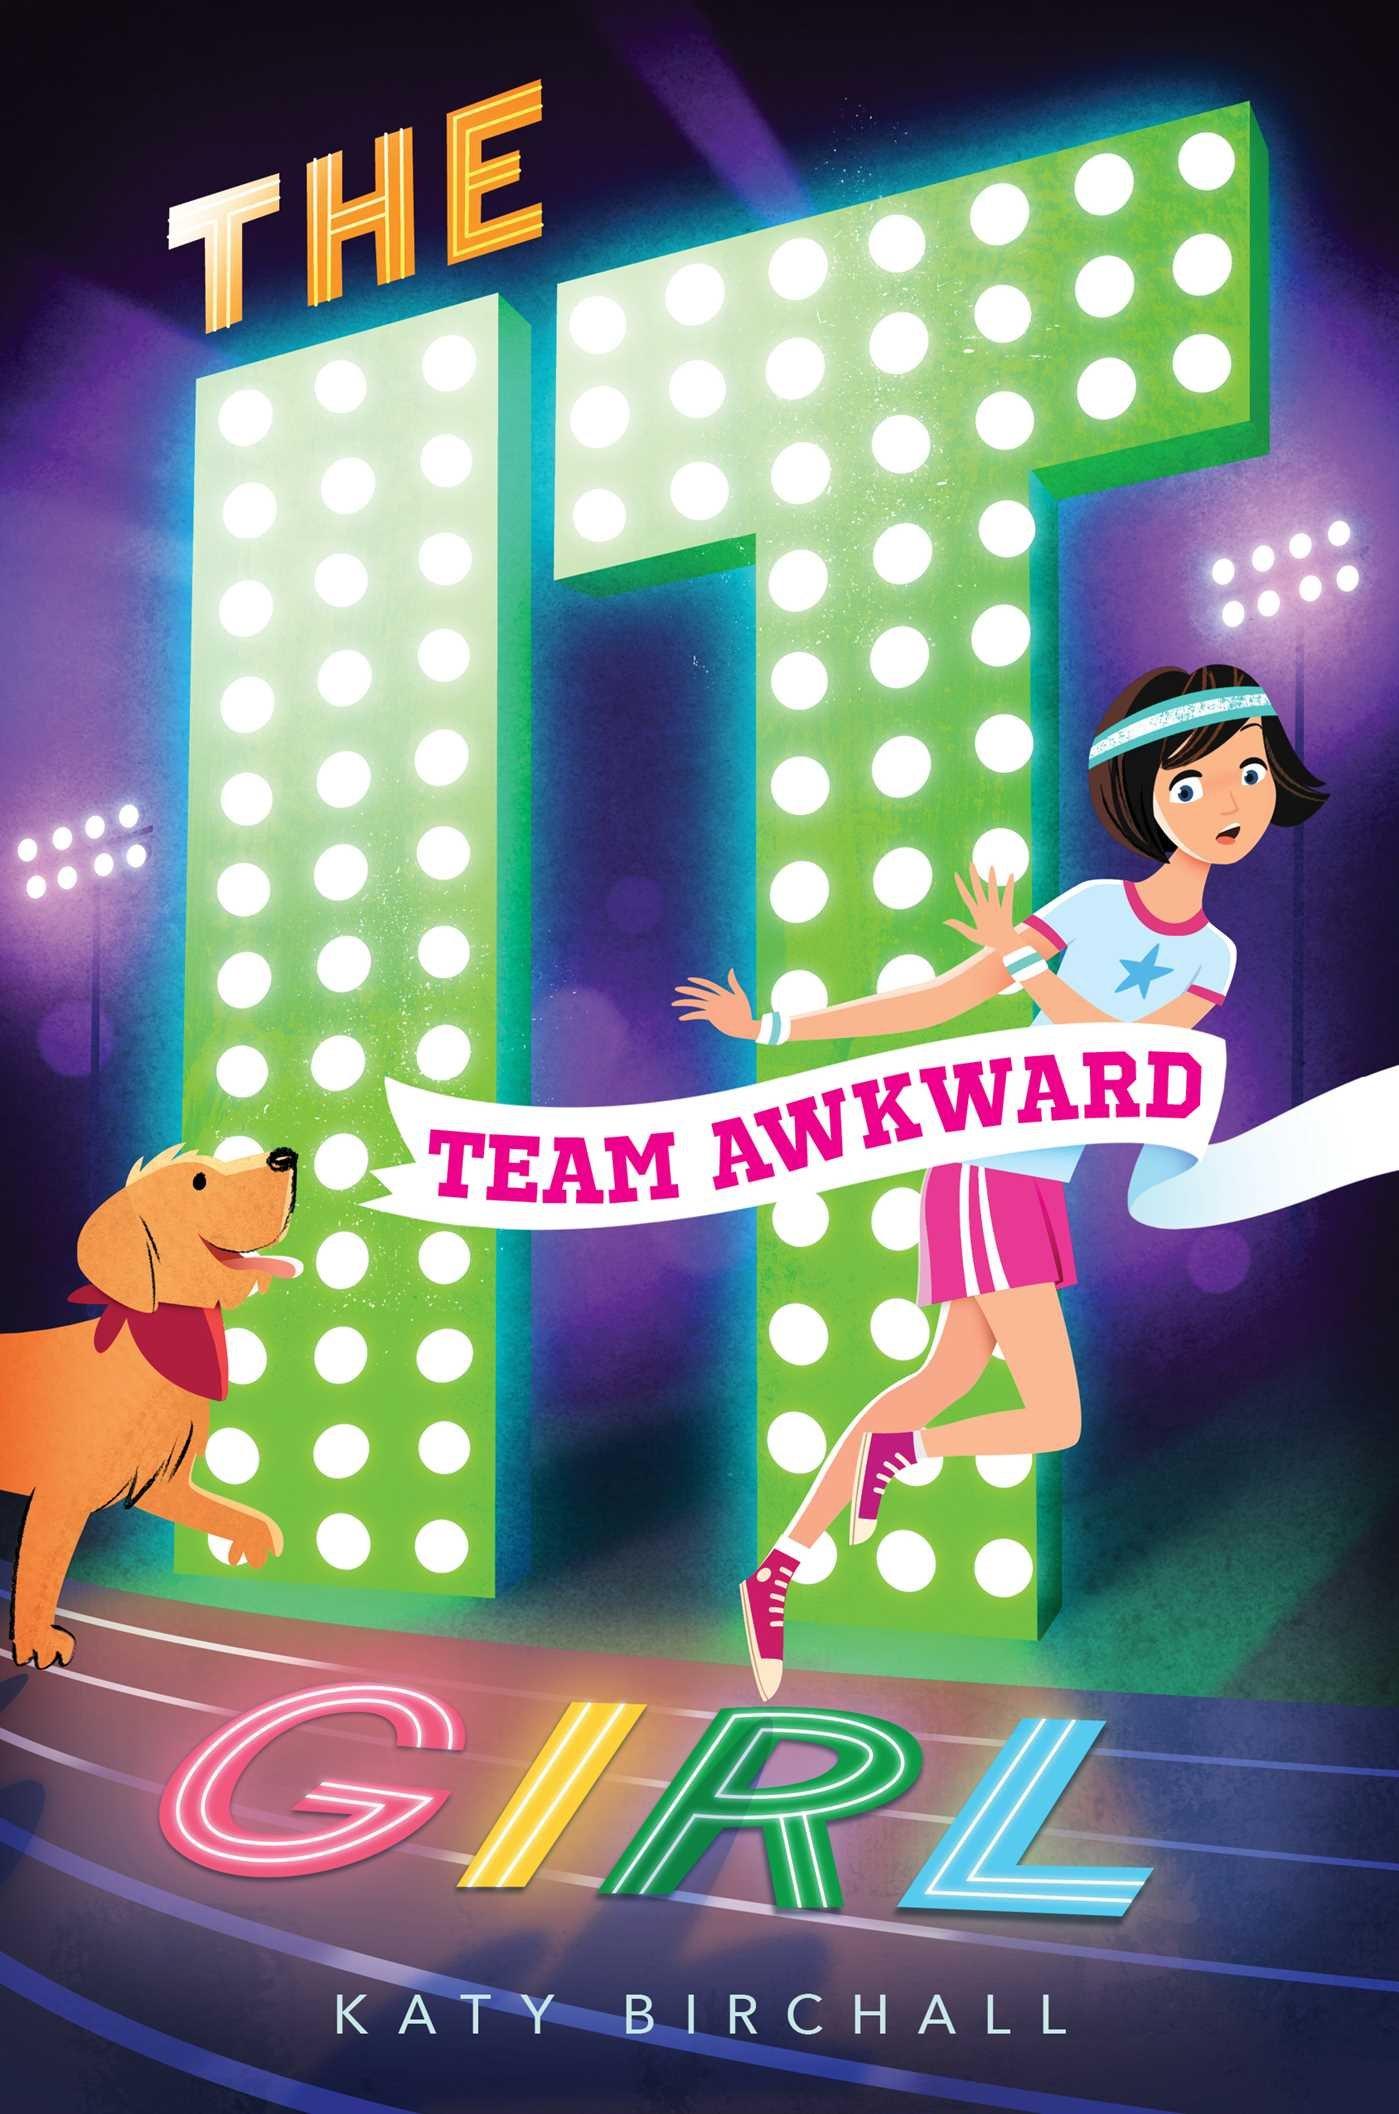 Team Awkward (The It Girl)